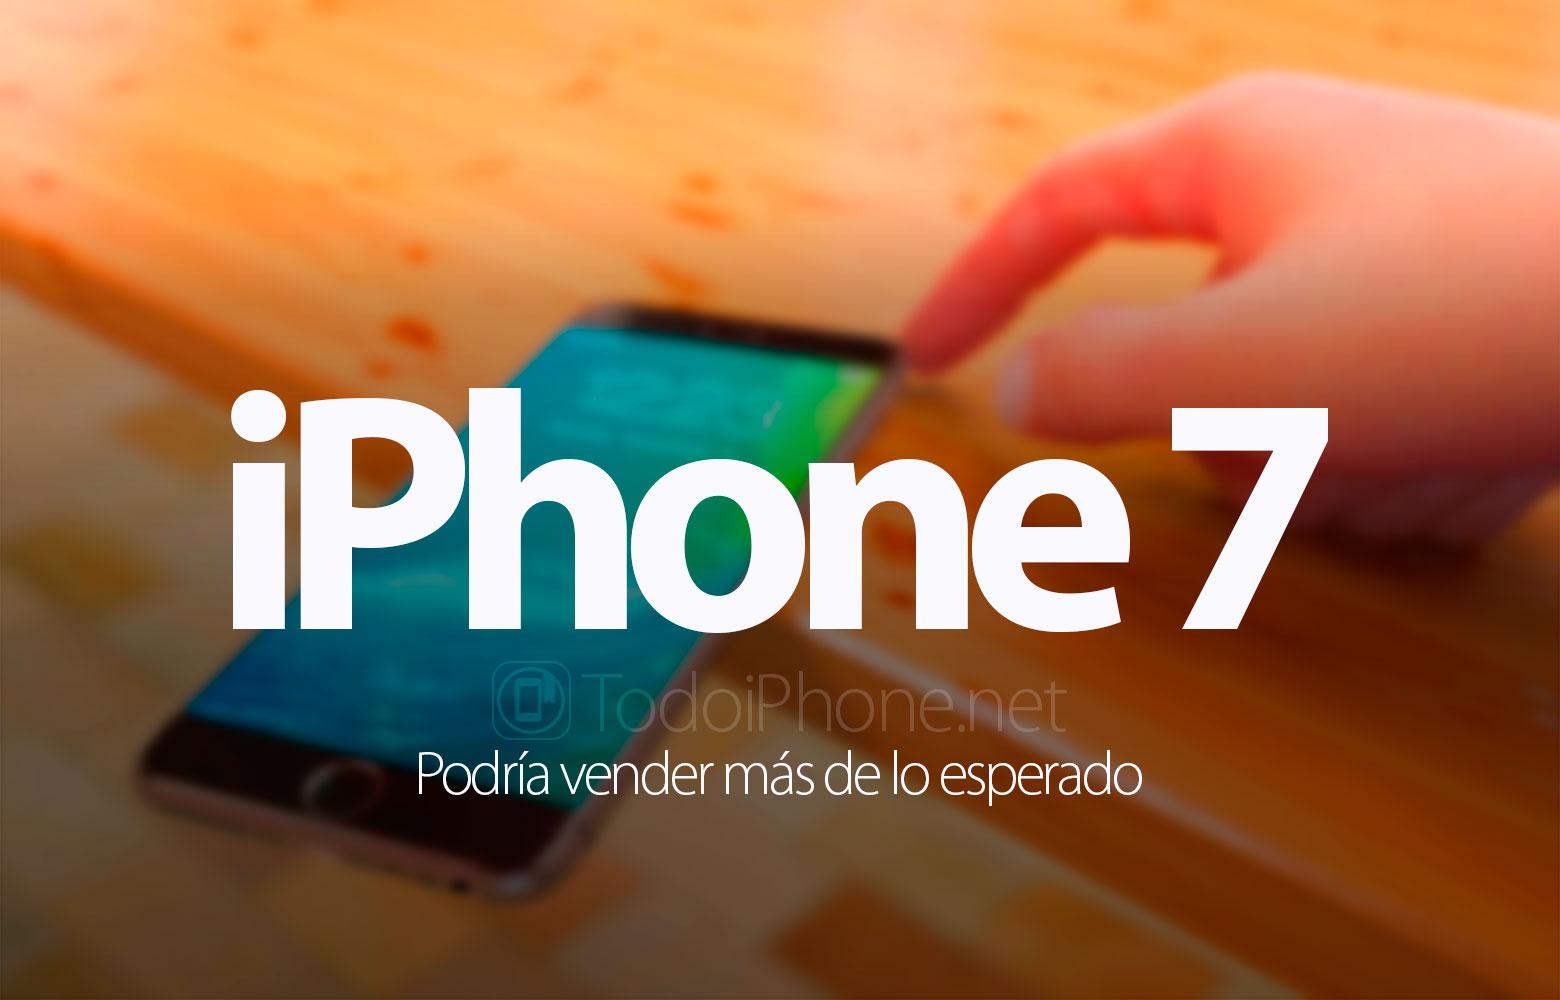 iphone-7-podria-vender-mas-esperado